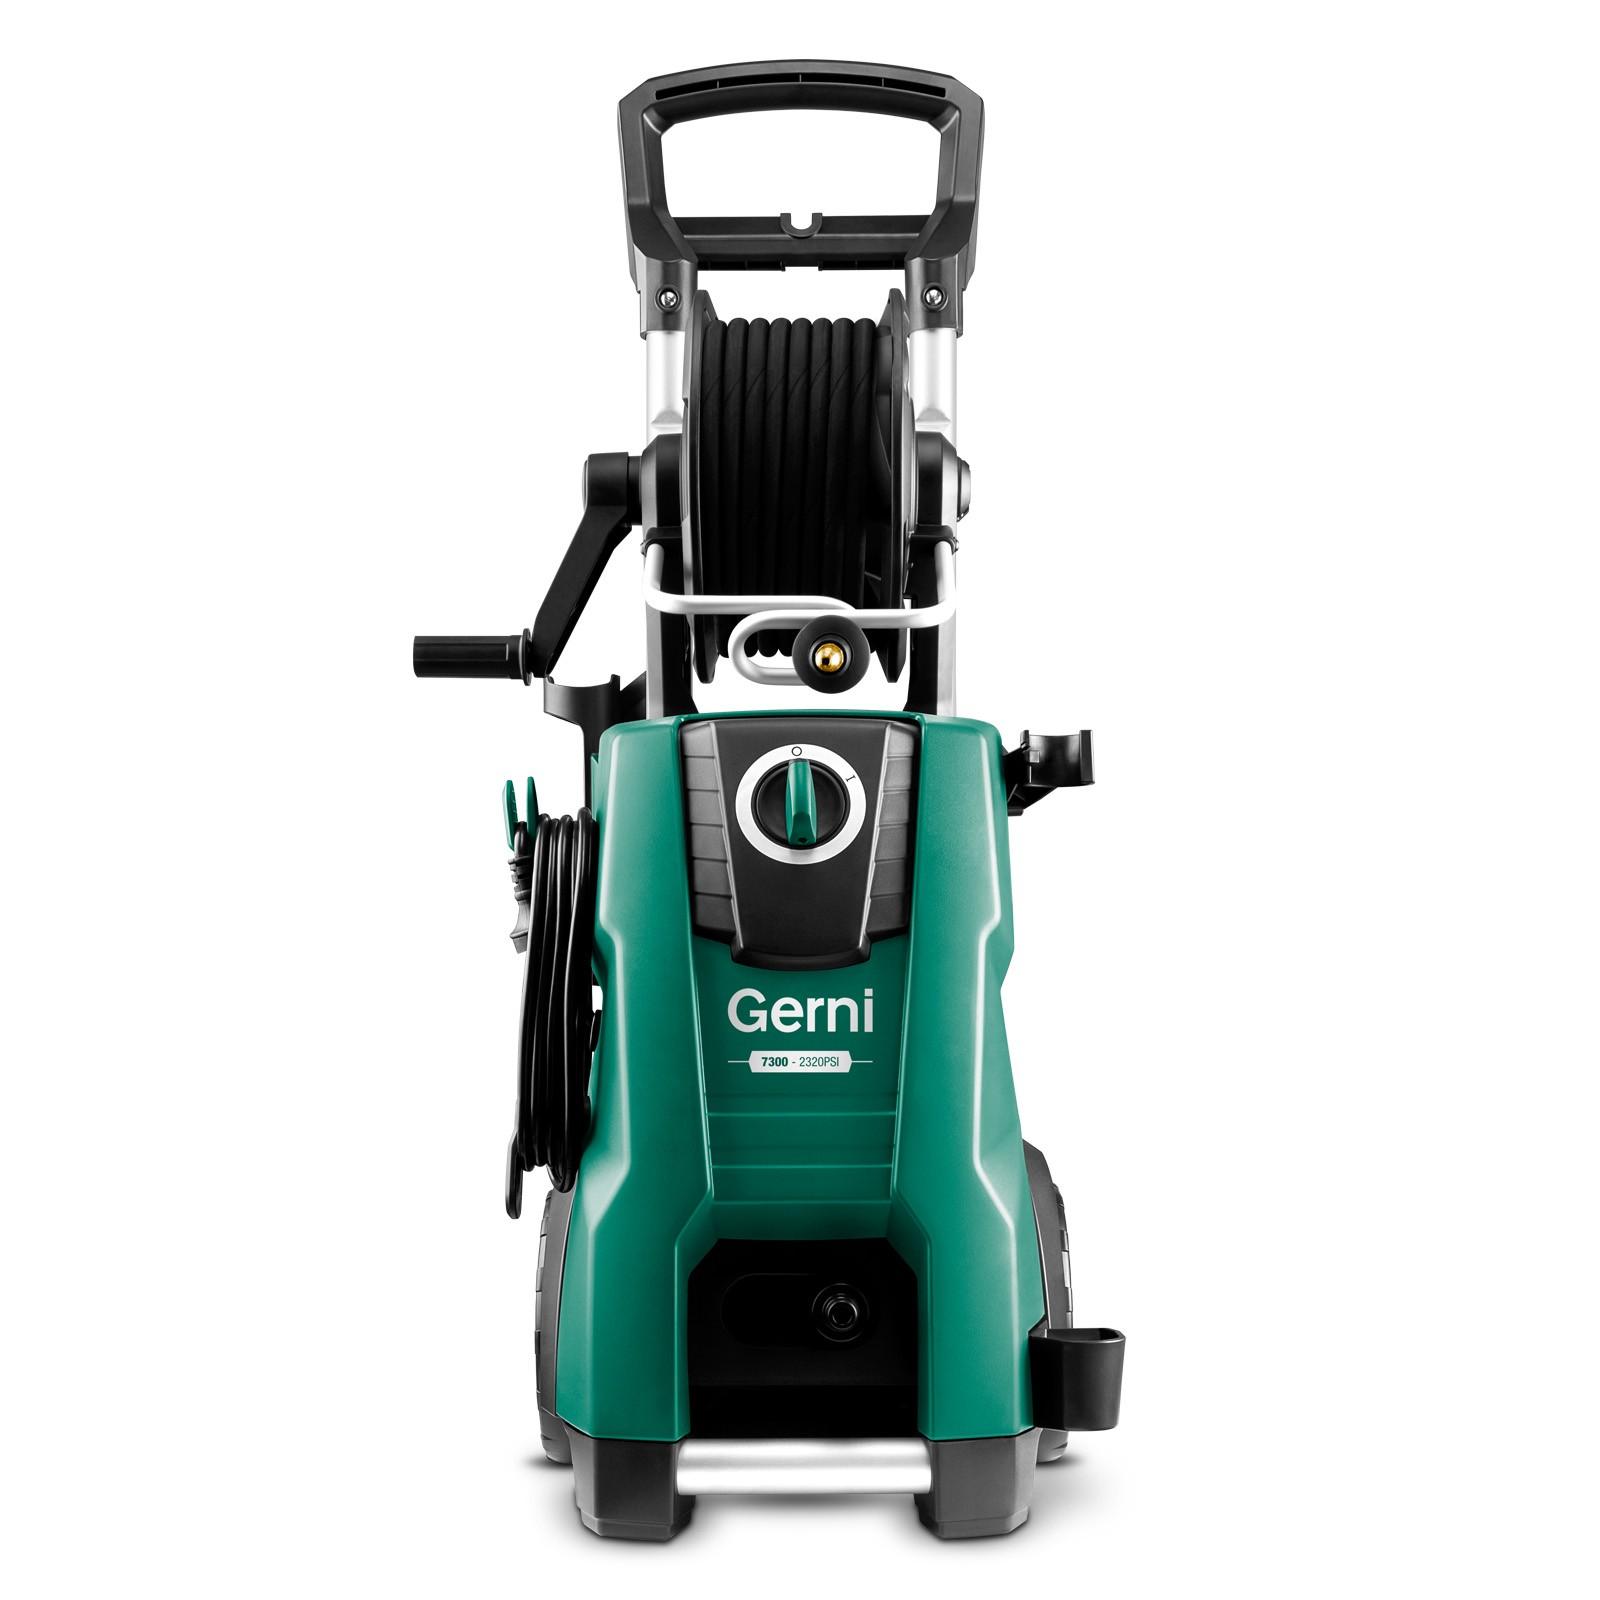 Gerni 7300 - Front